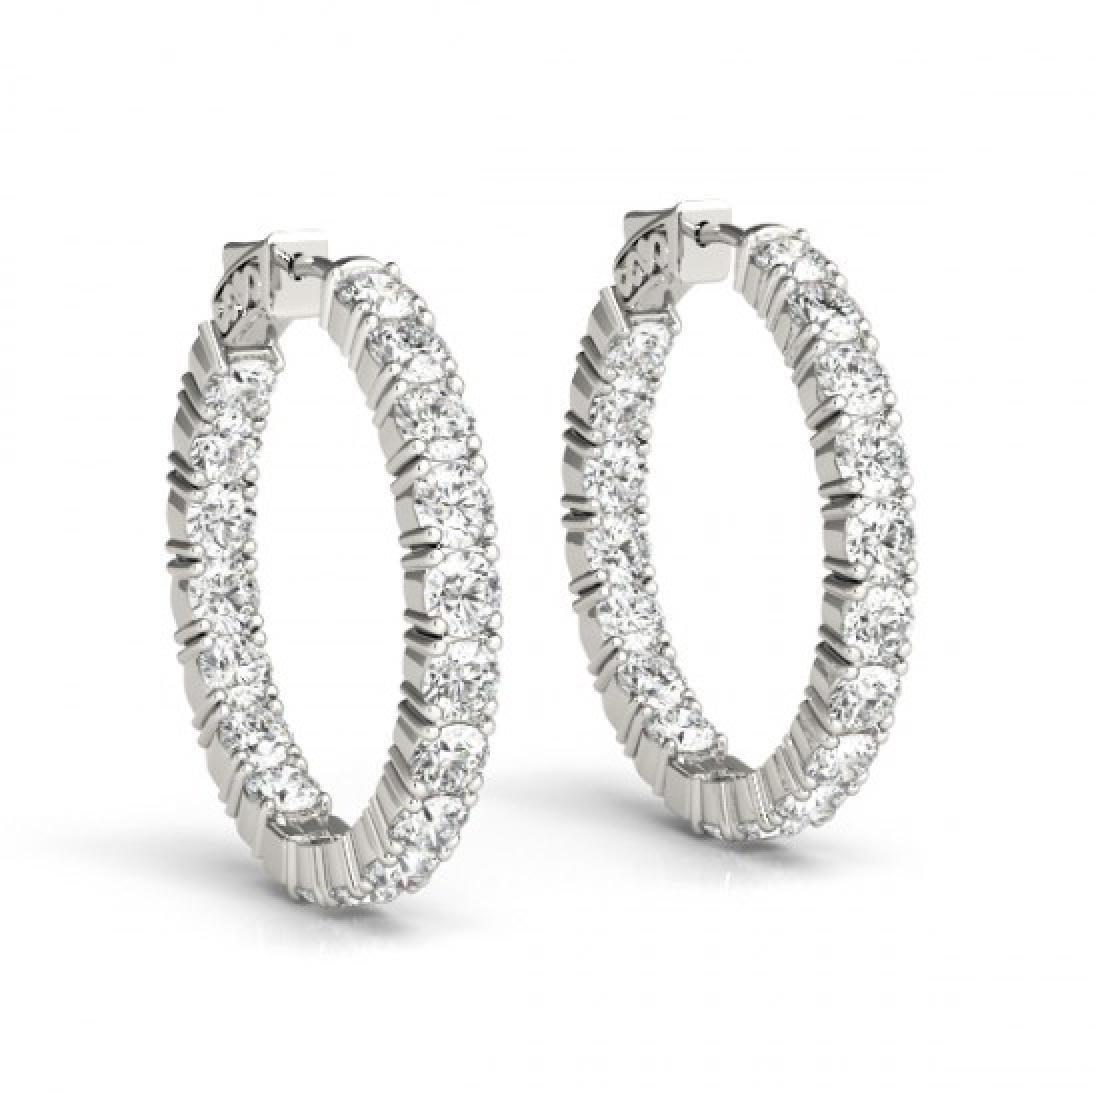 3.5 CTW Diamond VS/SI Certified 22 Mm Hoop Earrings 14K - 2